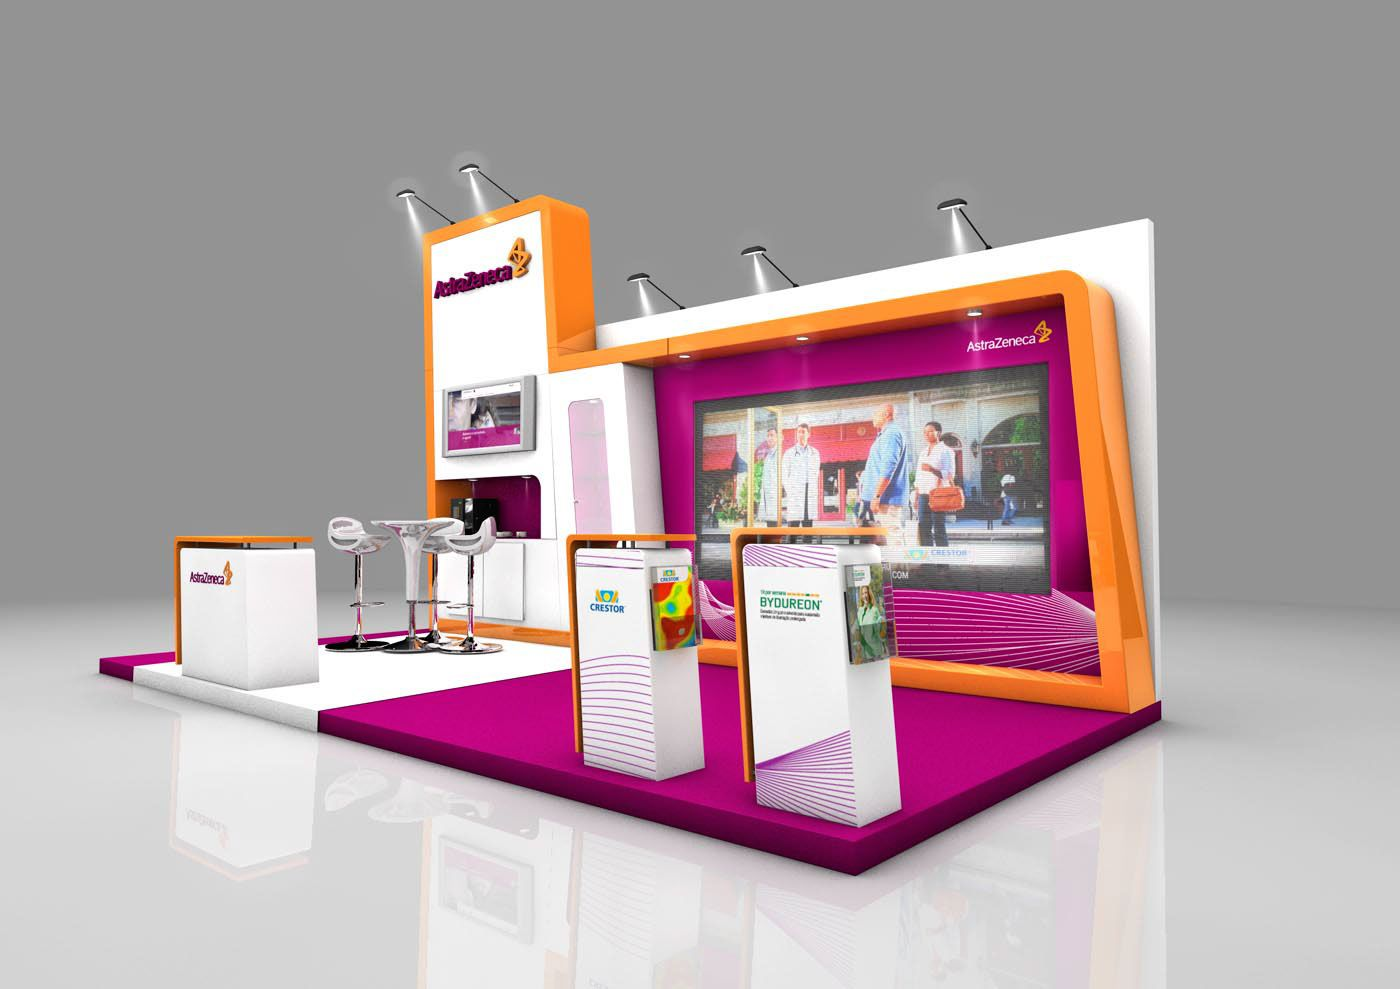 Exhibition Booth Design For Astrazeneca Exhibition Booth Exhibition Booth Design Stand Design